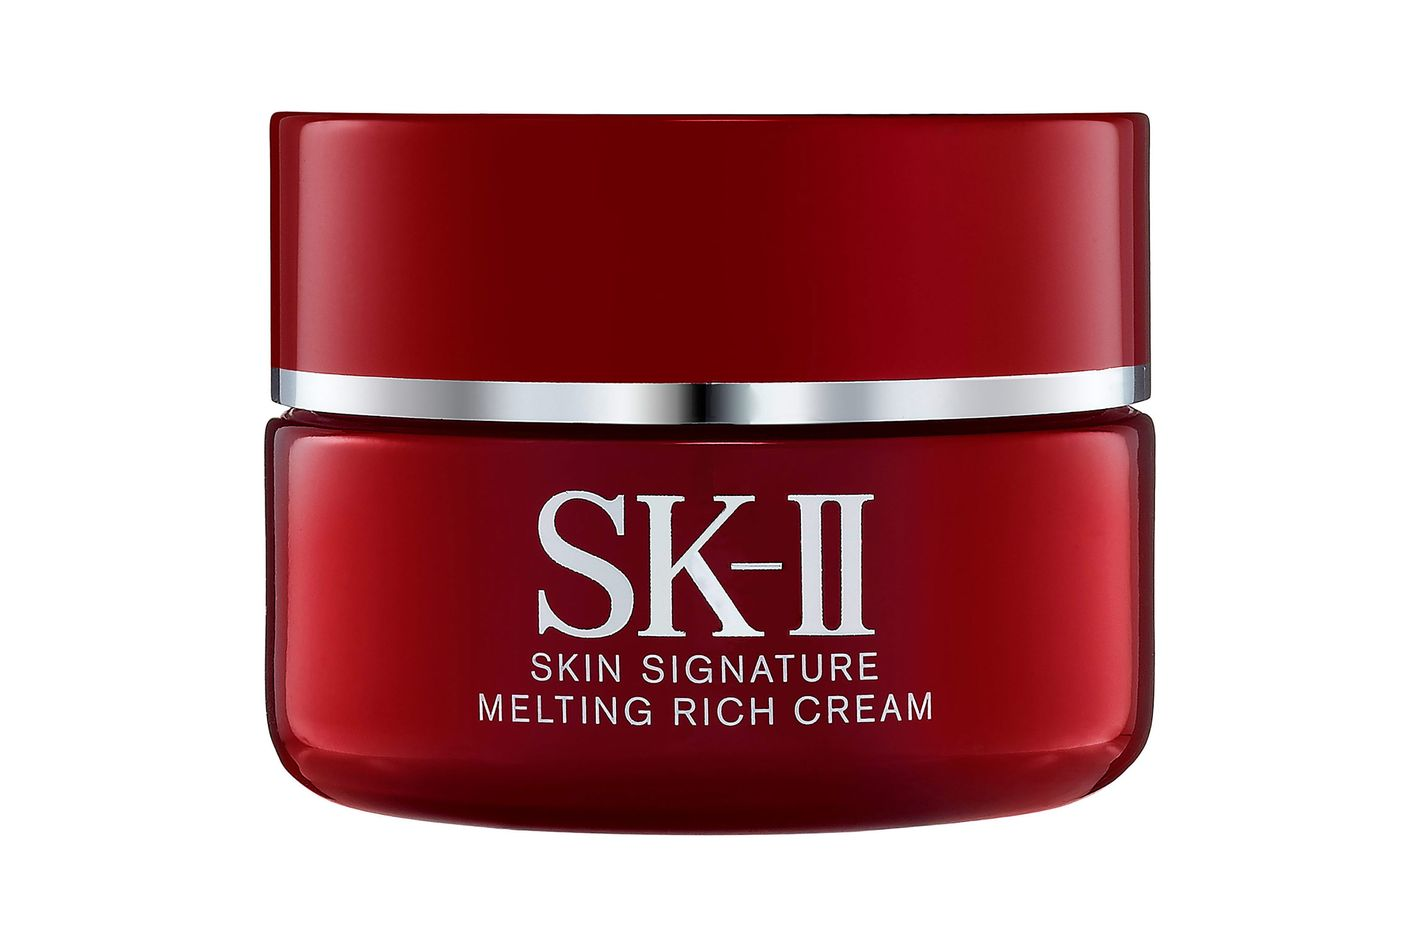 SK-II Skin Signature Melting Rich Cream